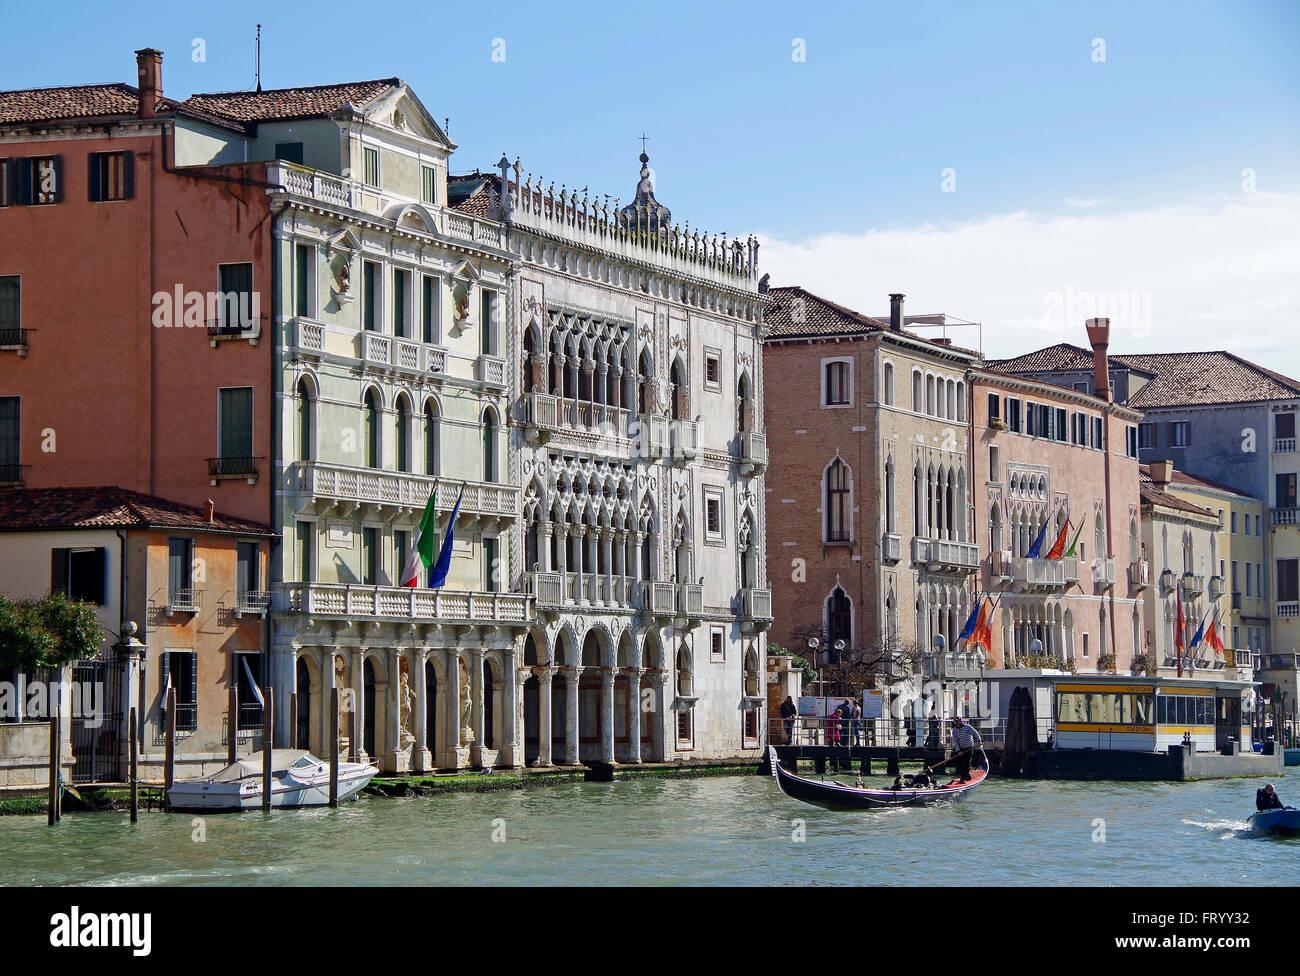 L'Italie, Venise, Ca' d'Oro, Grand Canal, en contexte Photo Stock